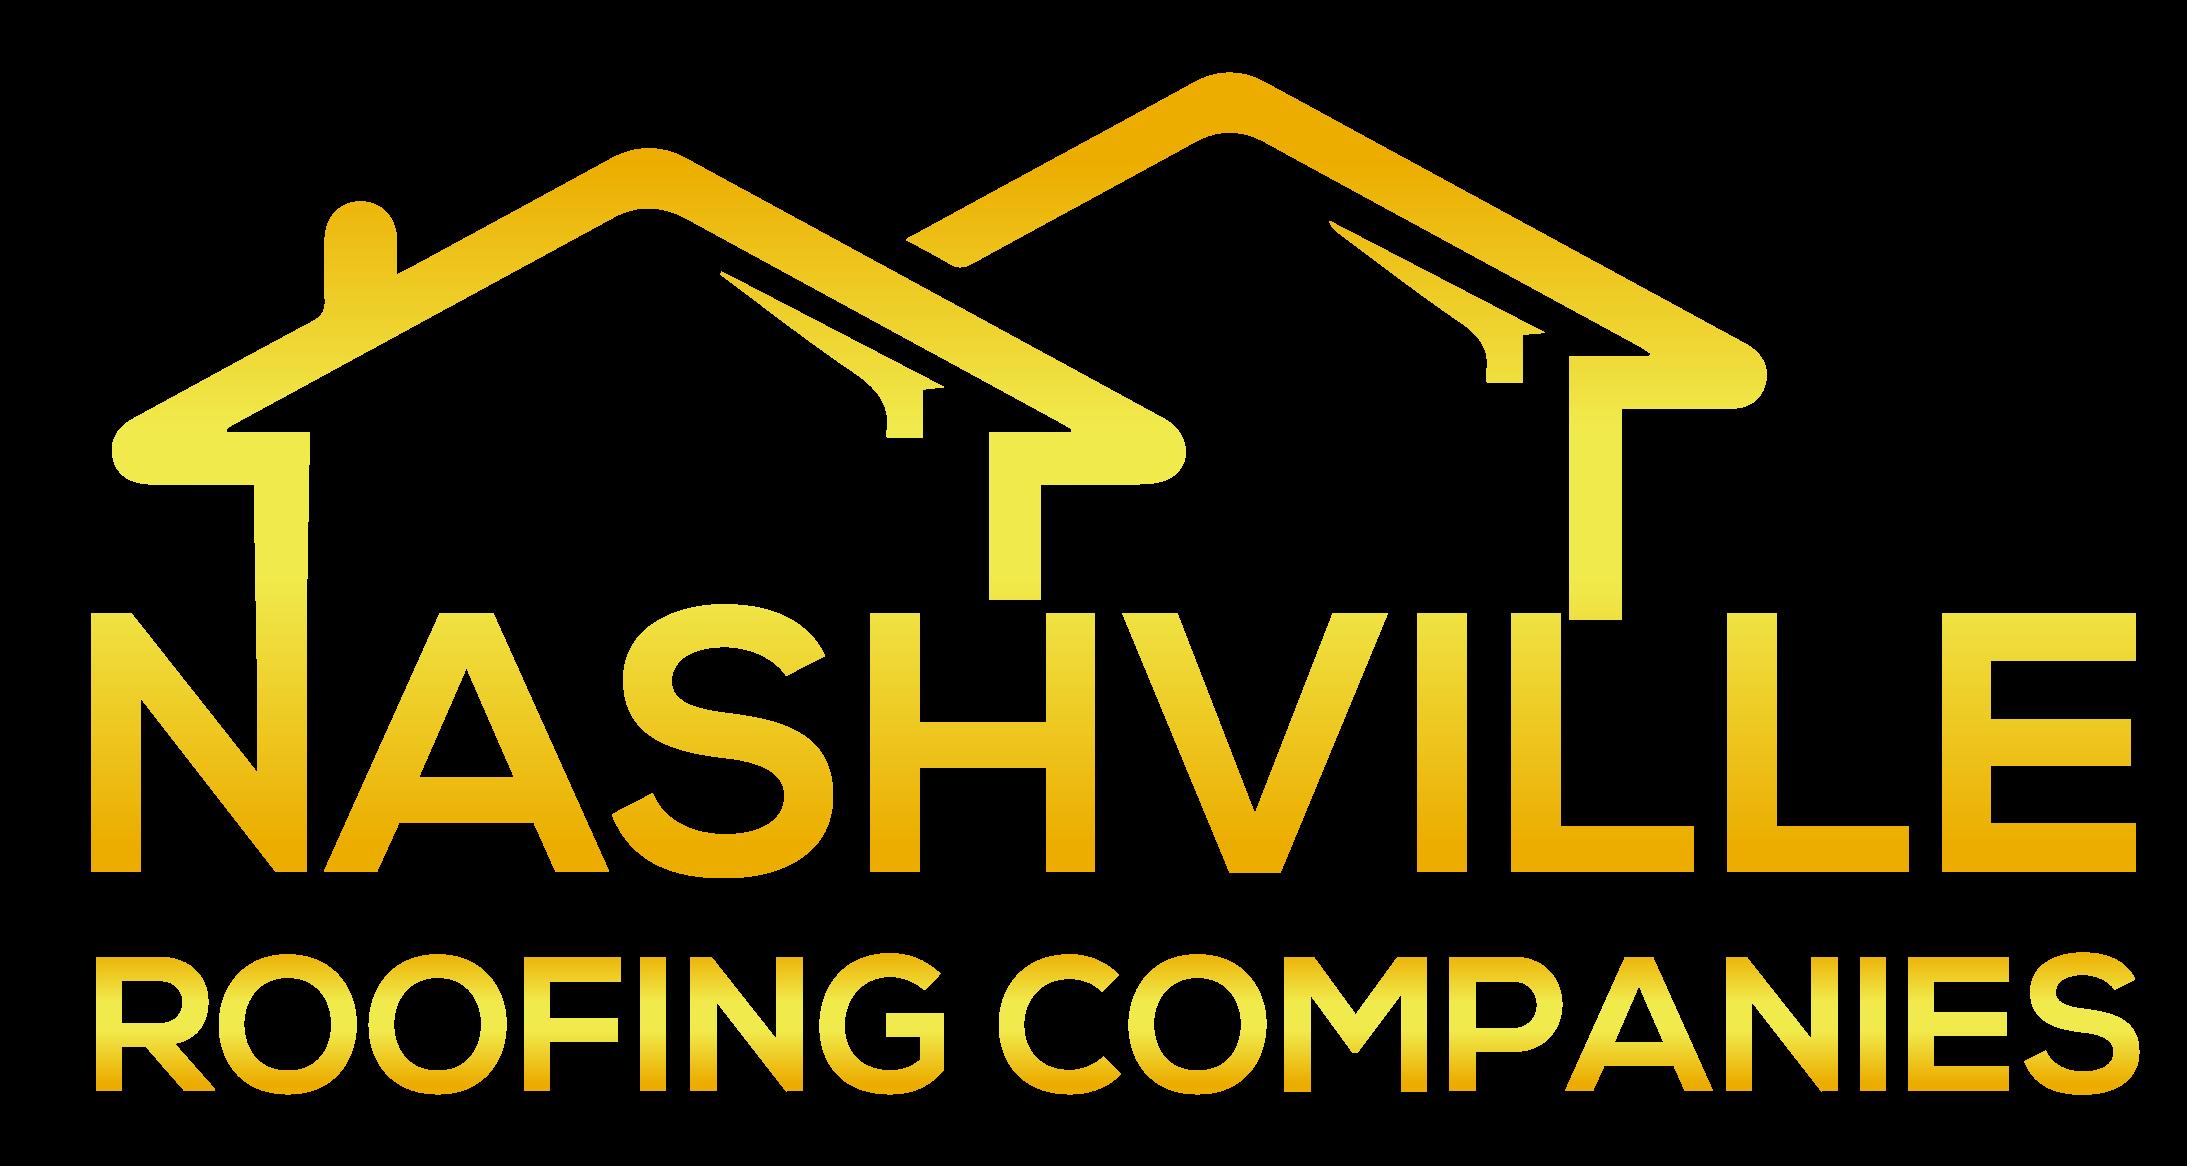 Nashville Roofing Companies